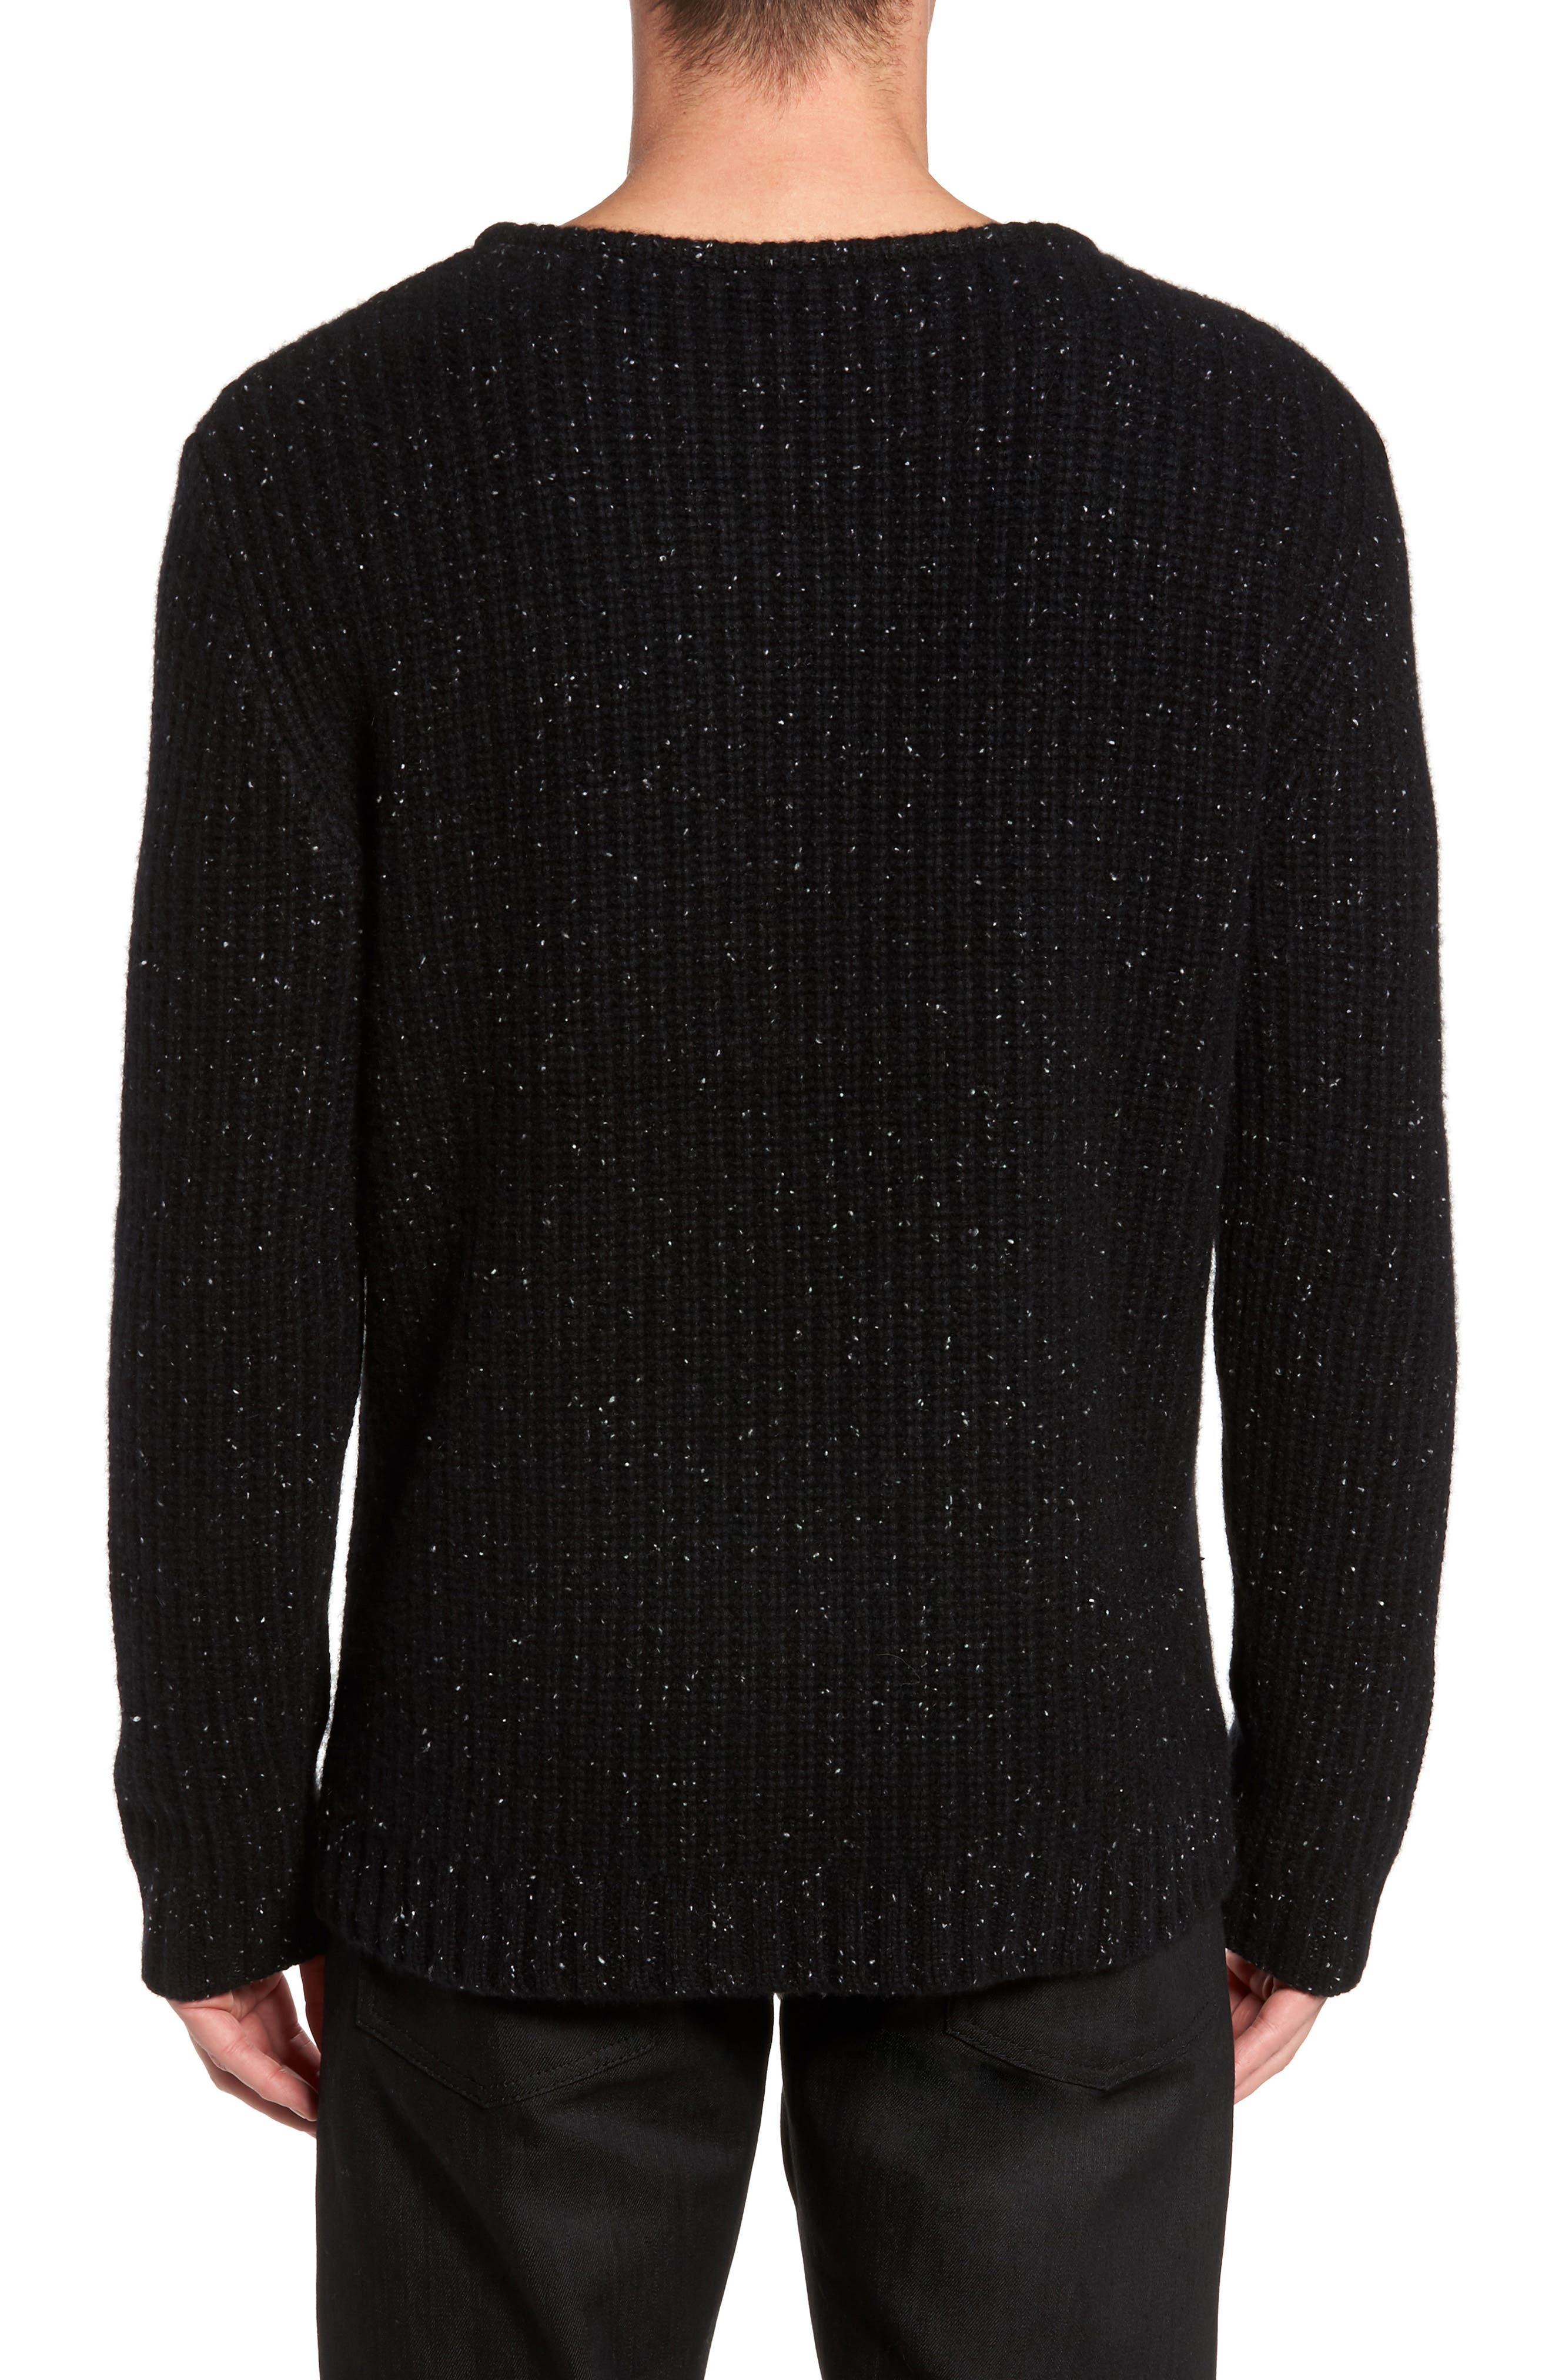 Oversize Cashmere Sweater,                             Alternate thumbnail 2, color,                             001